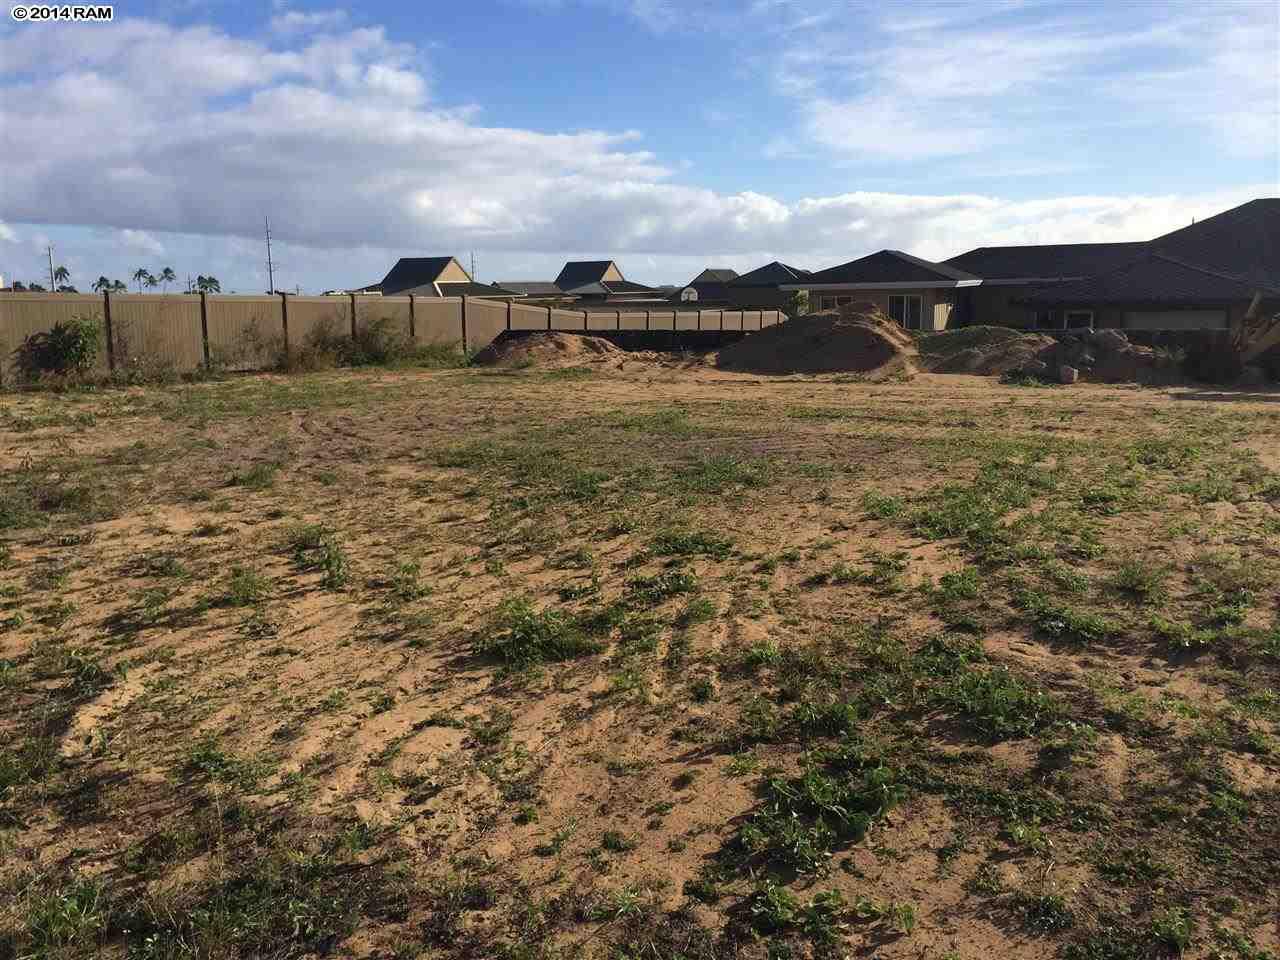 68 Keoneloa St Lot 31 Wailuku, Hi 96793 vacant land - photo 6 of 8